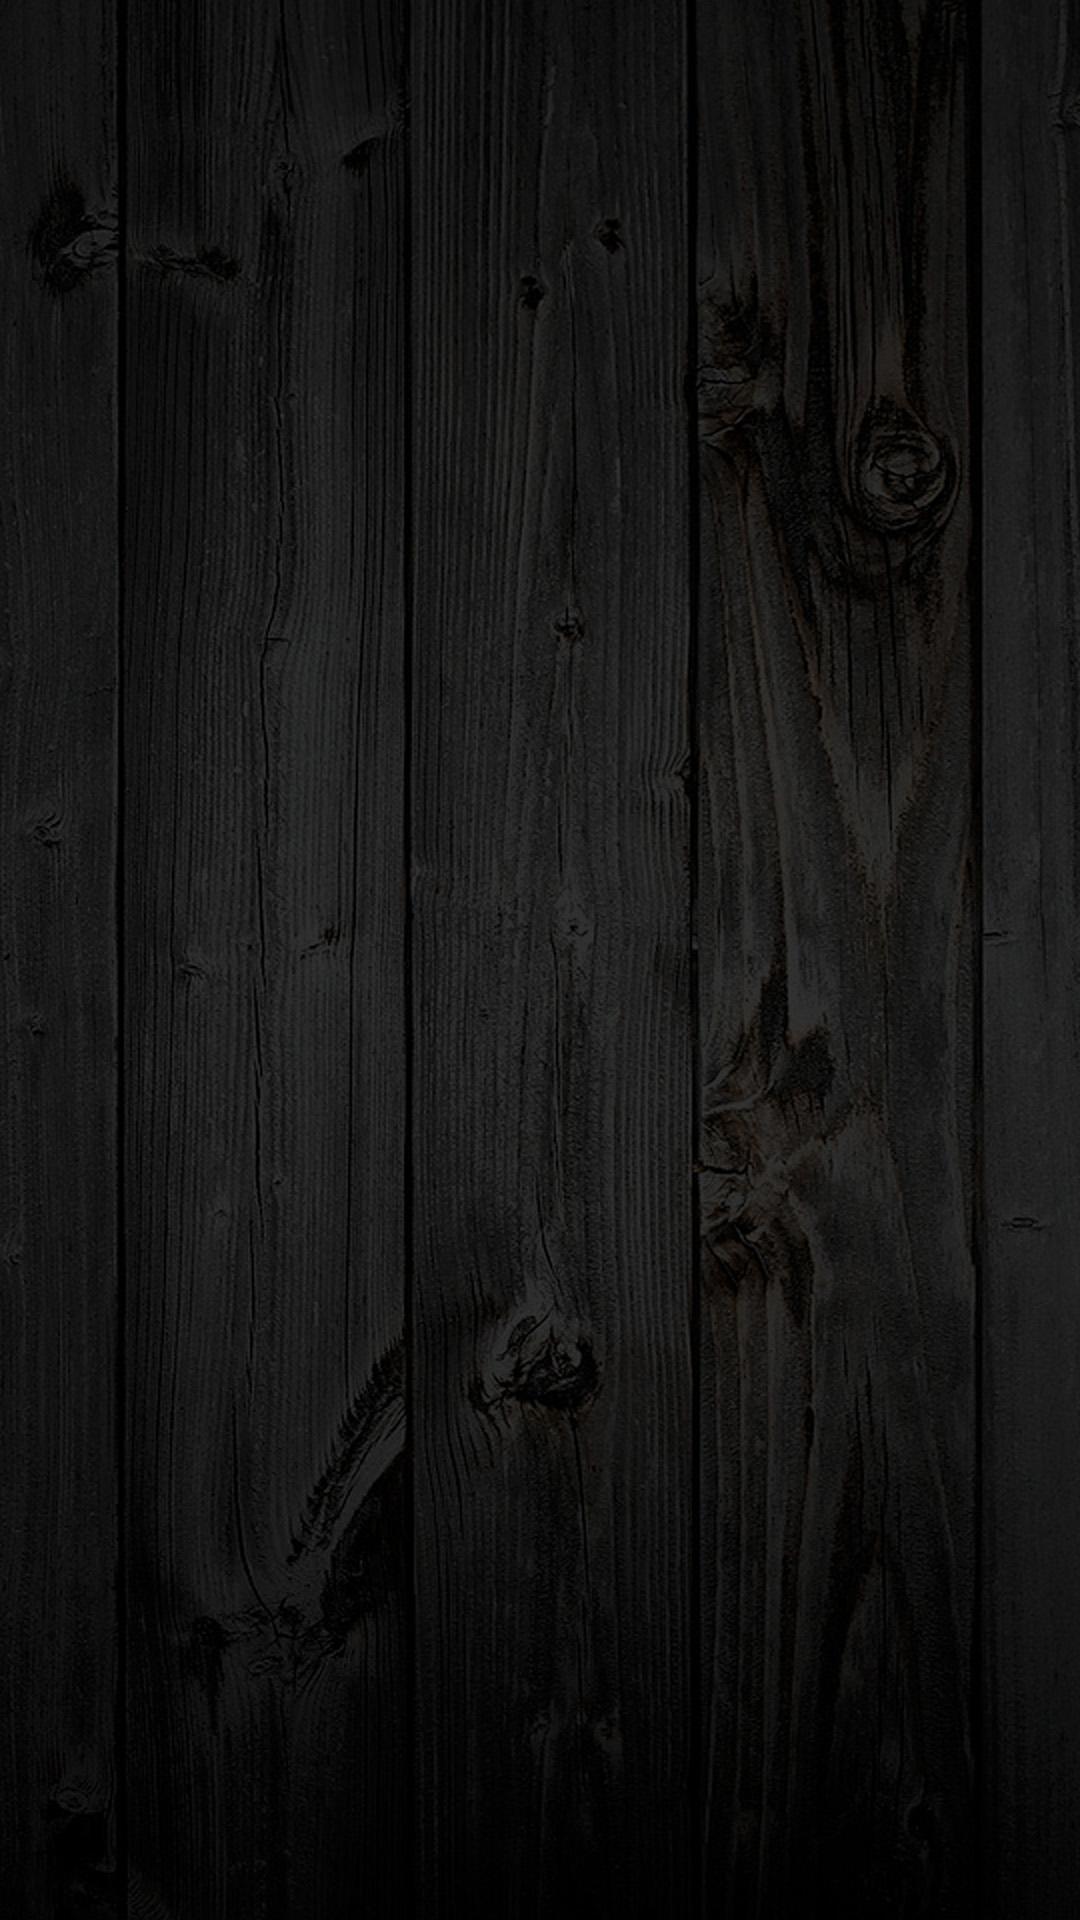 Background Dark wood texture HD Wallpaper iPhone 6 plus 1080x1920